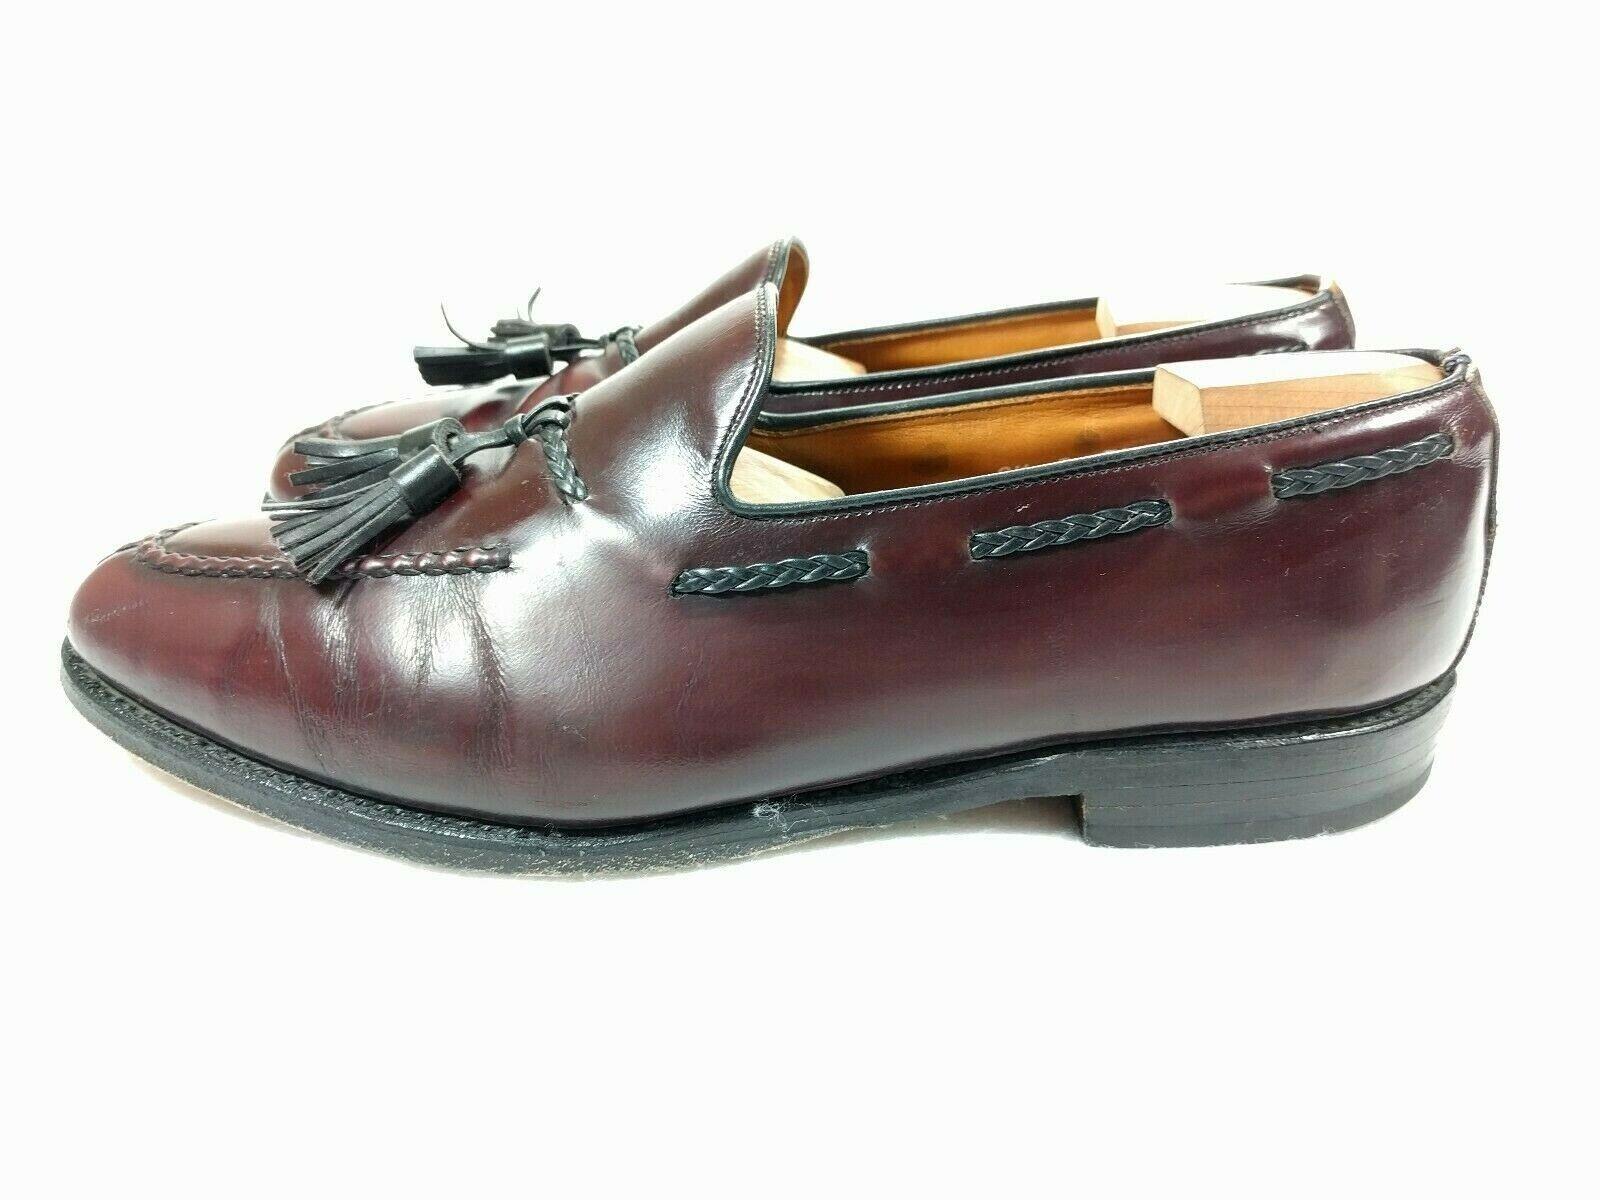 ALLEN EDMONDS Men's Pembrooke Burgundy Leather Tassel Loafers shoes Size 9.5 B